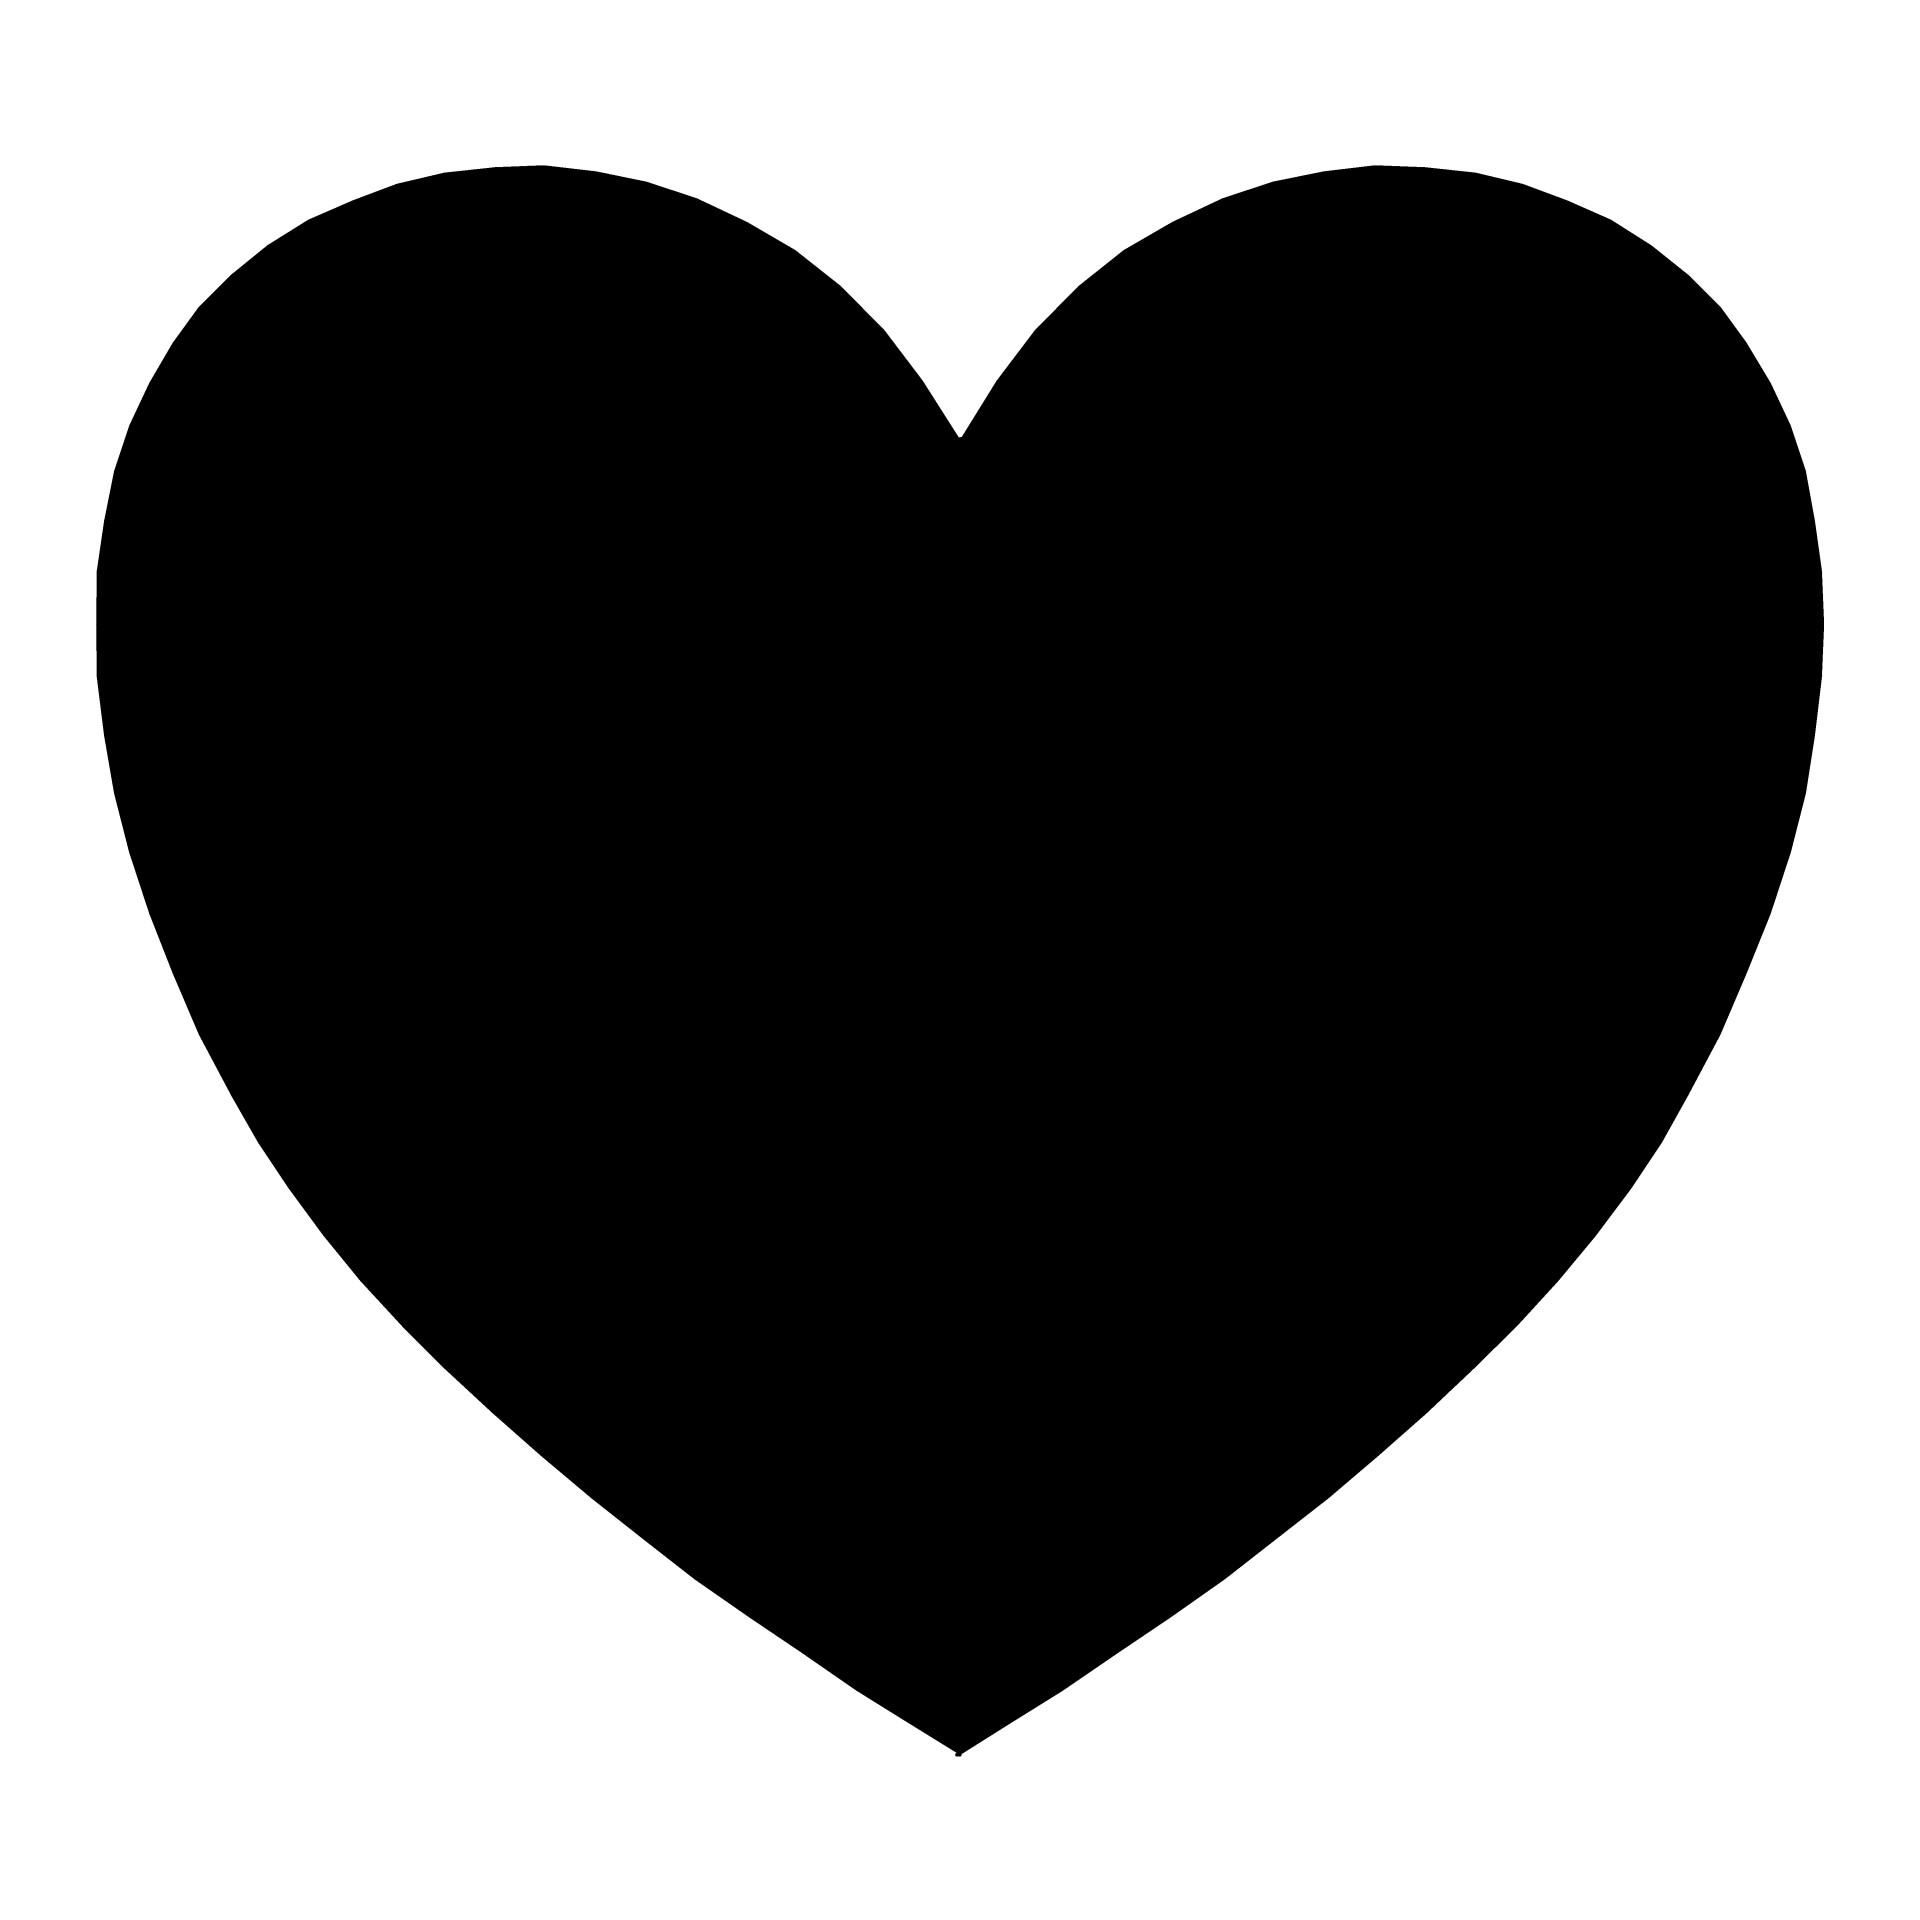 1920x1920 Silhouette Heart Free Stock Photo